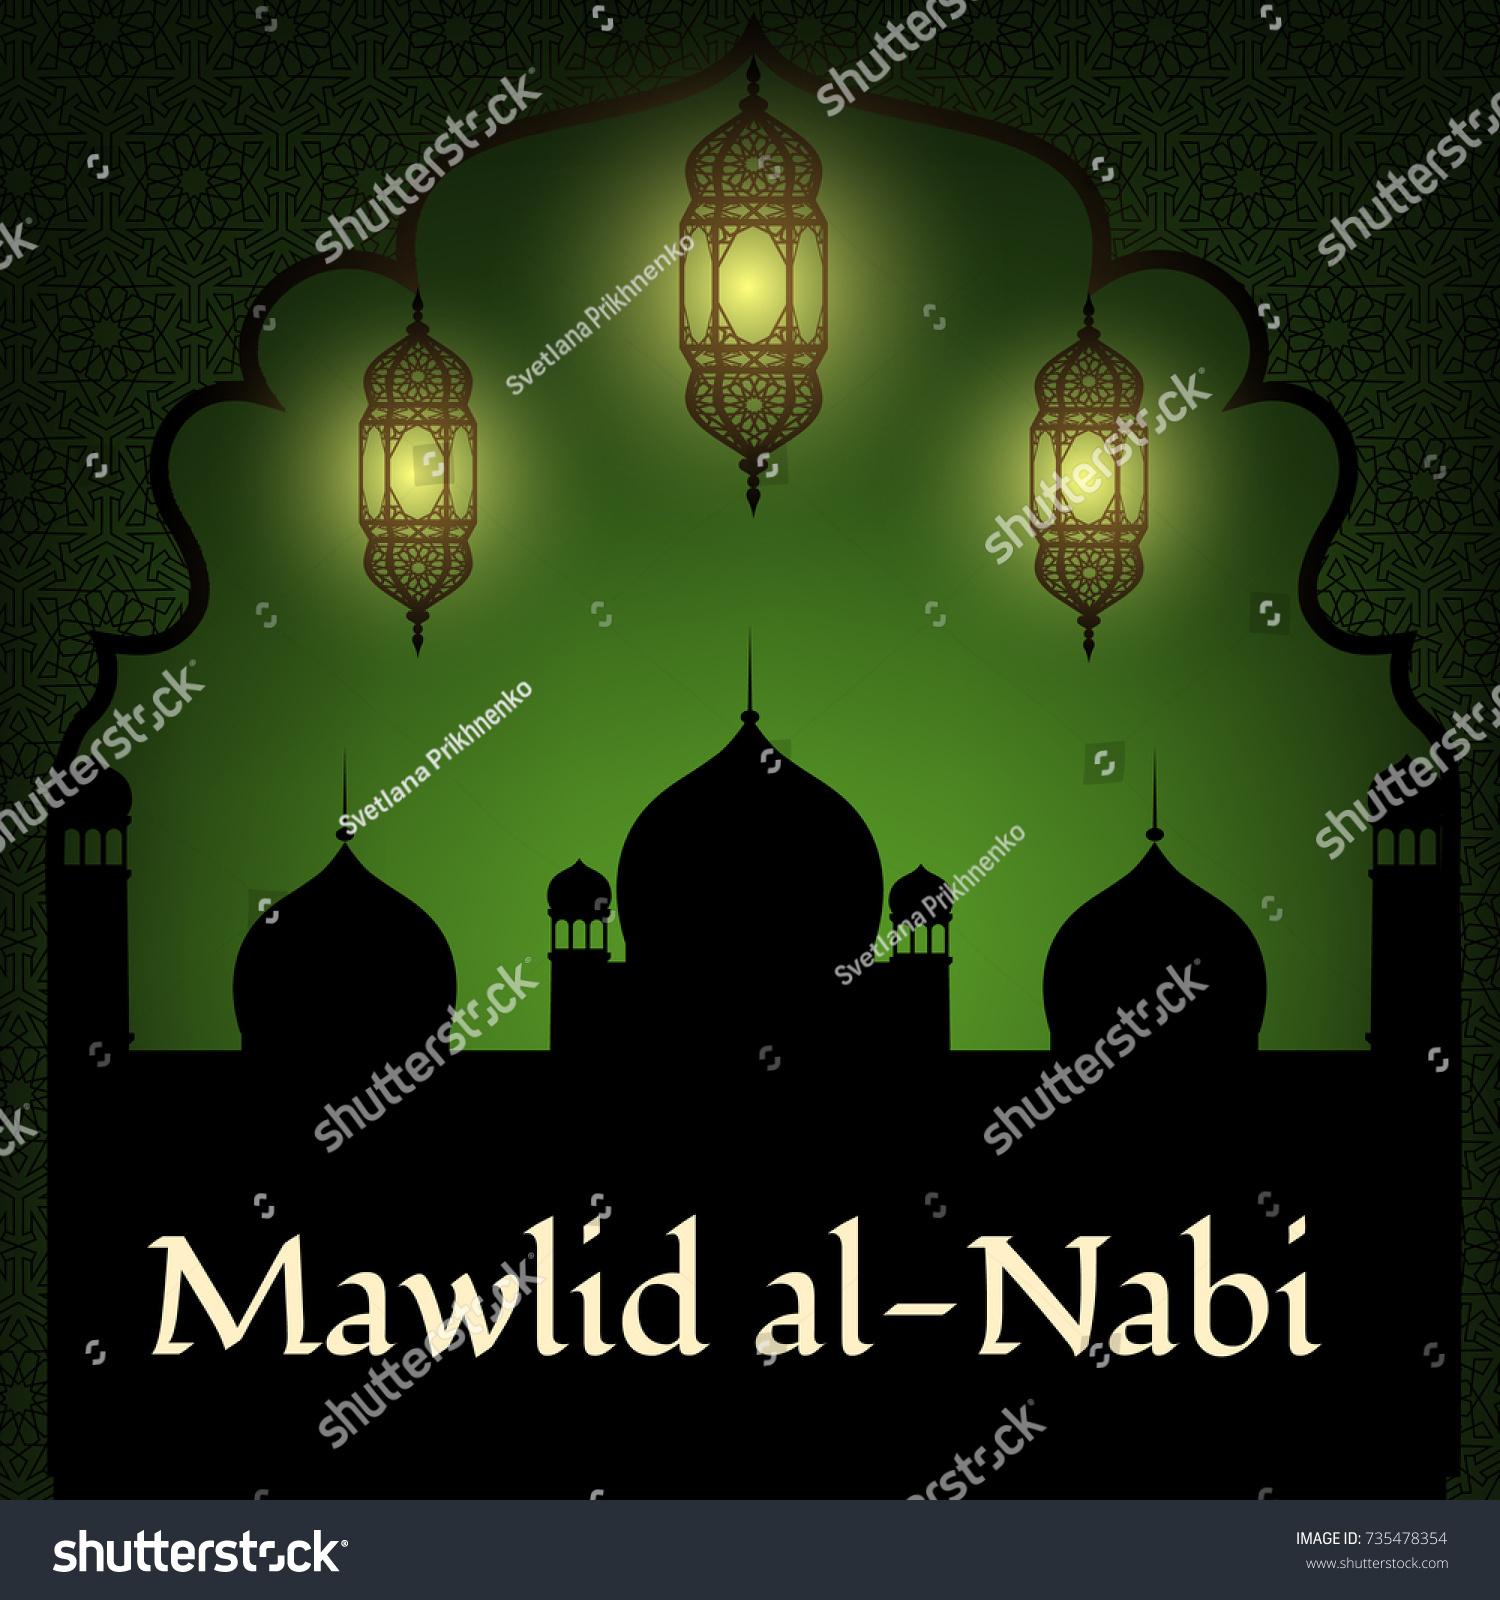 Mawlid Al Nabi Translation Prophet Muhammads Birthday Greeting